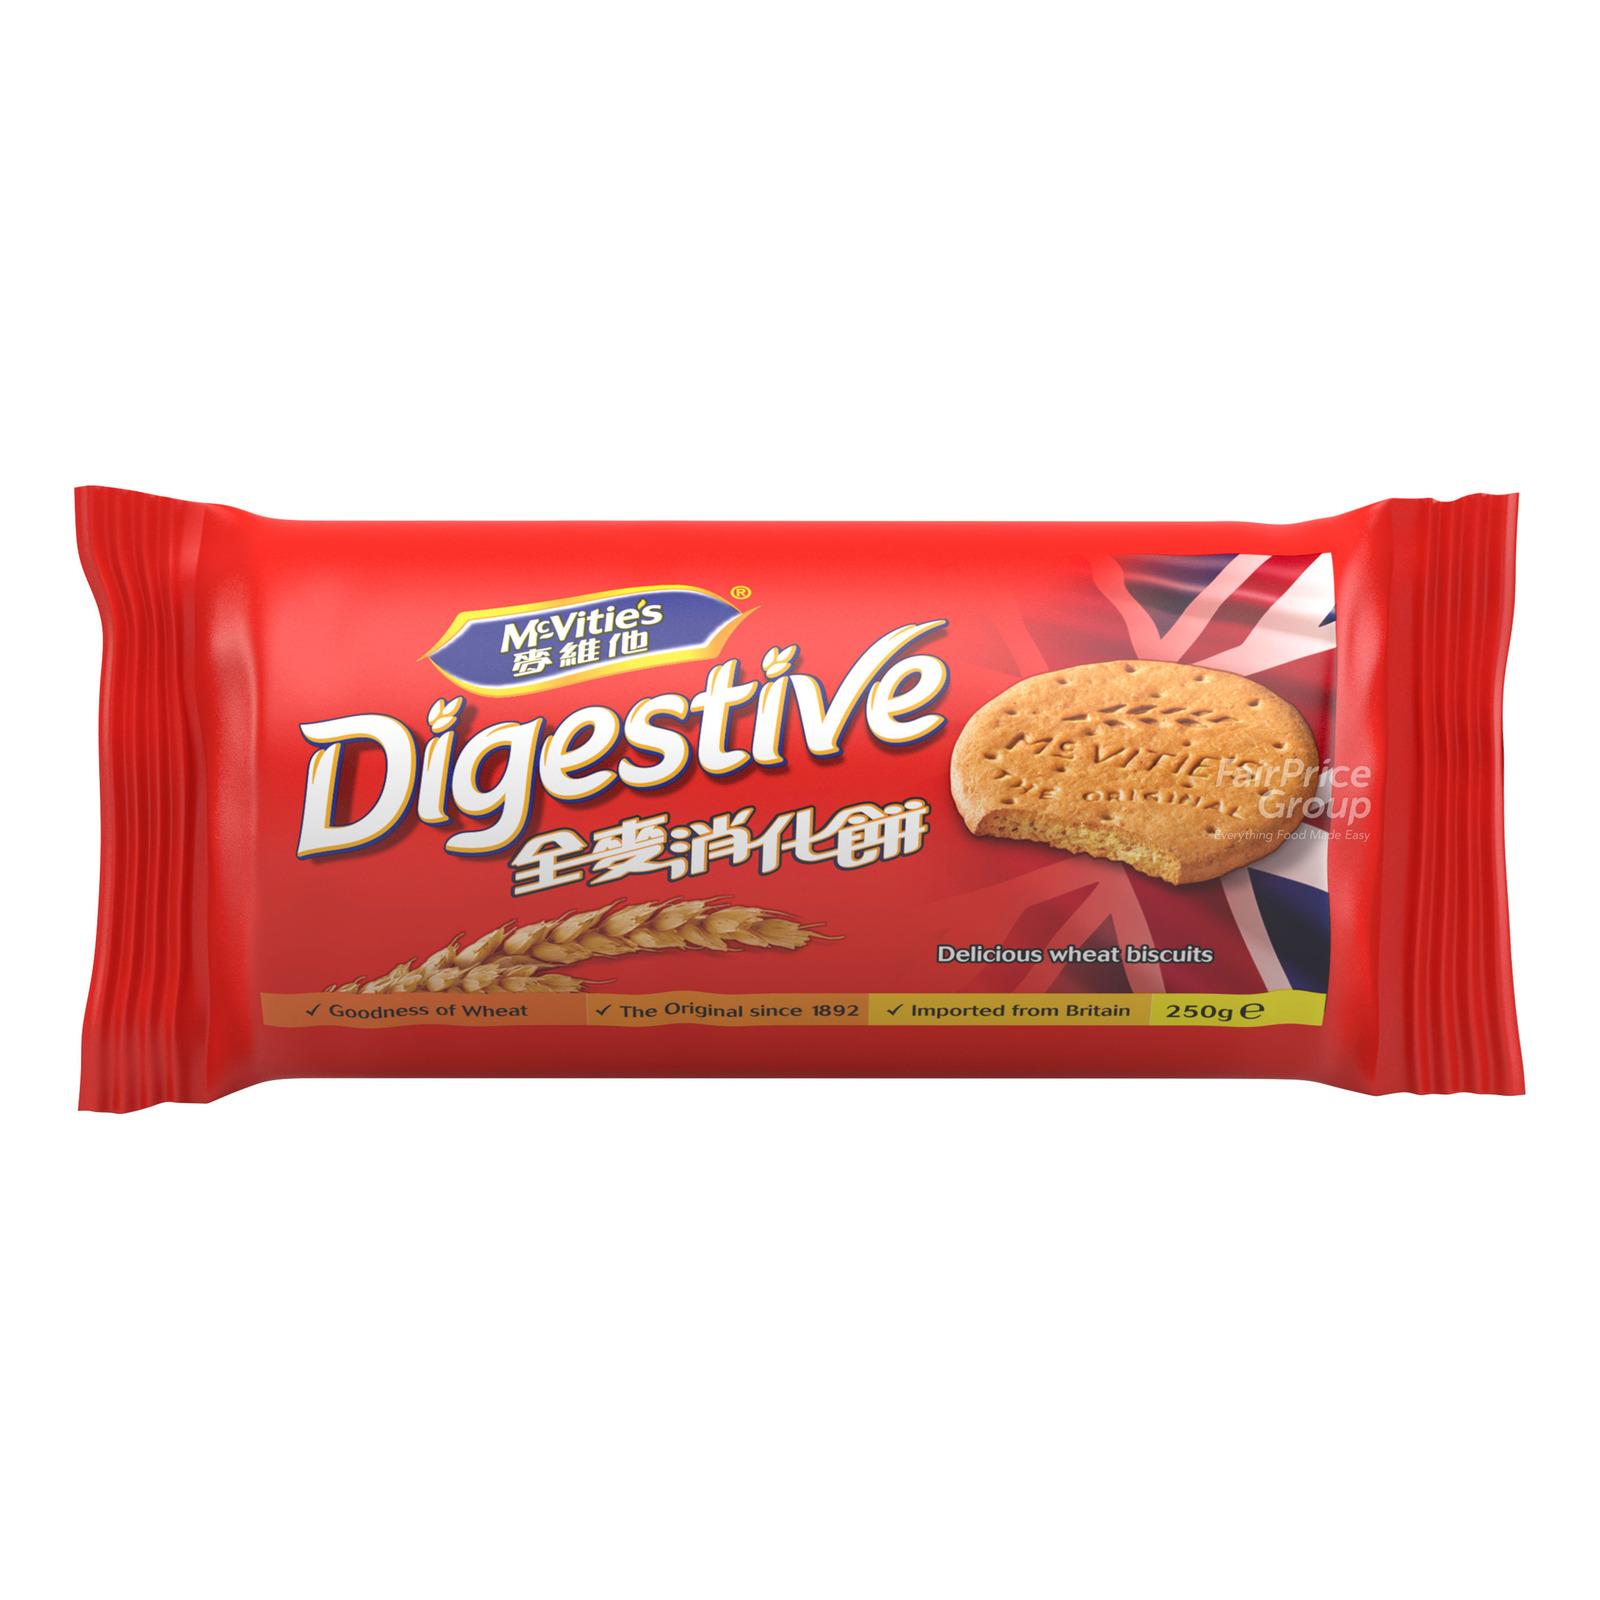 McVitie's Digestive Biscuits - Original